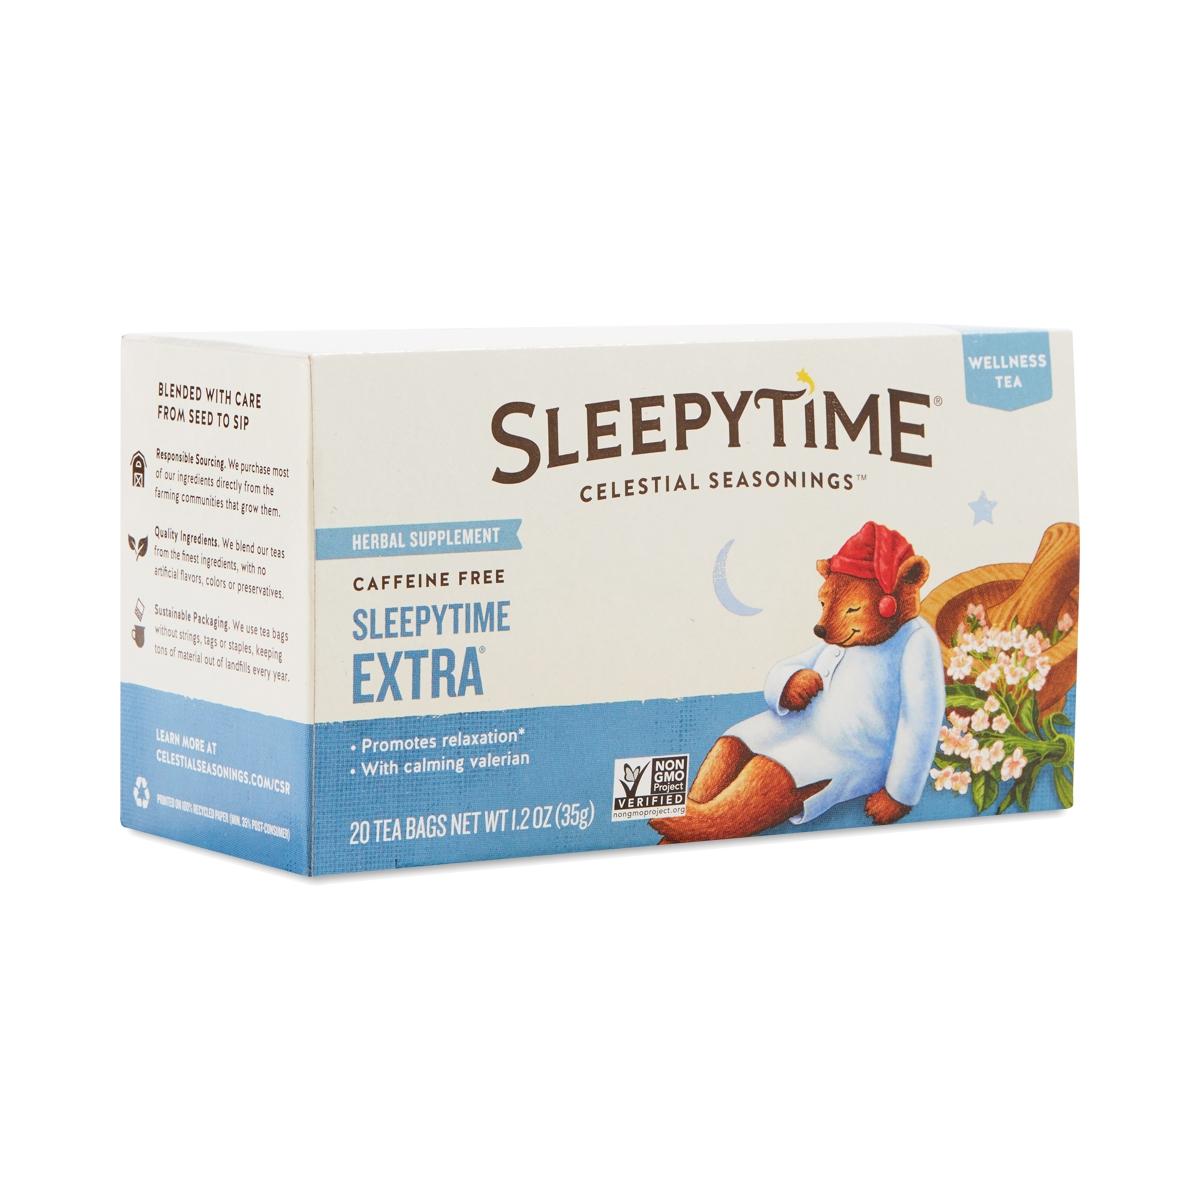 Sleepytime Extra Tea By Celestial Seasonings Thrive Market